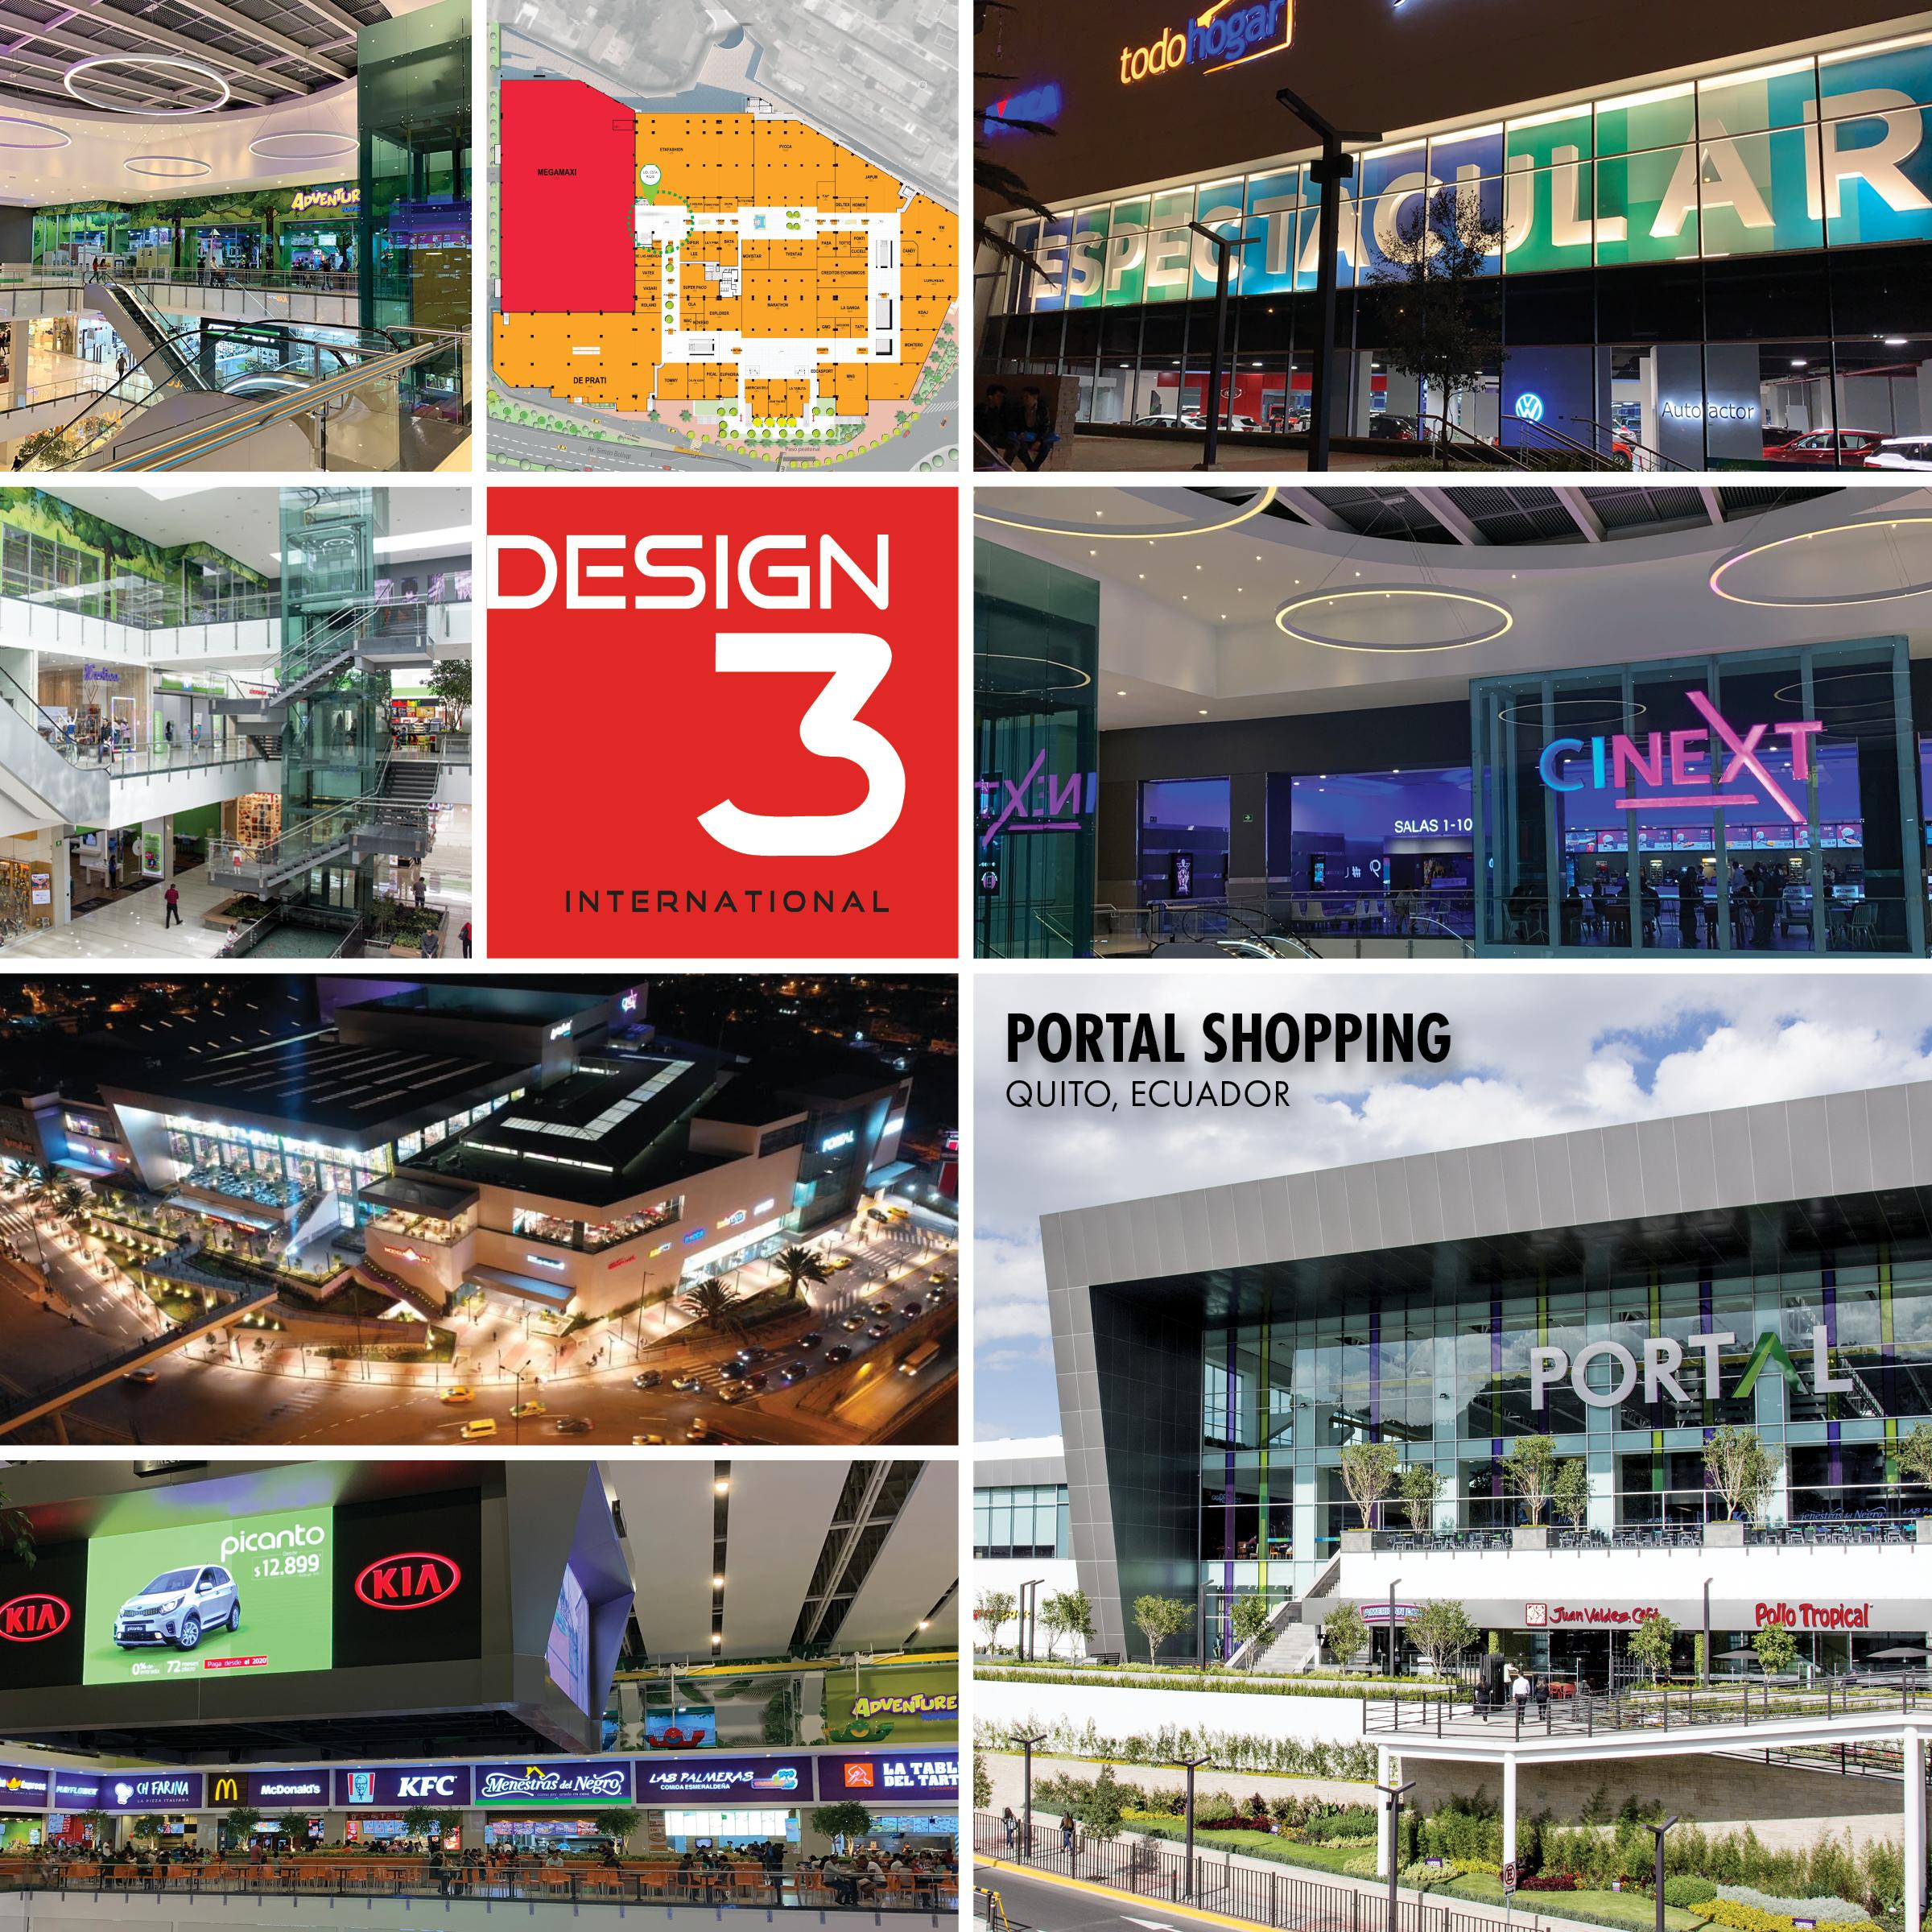 Portal Shopping Architects